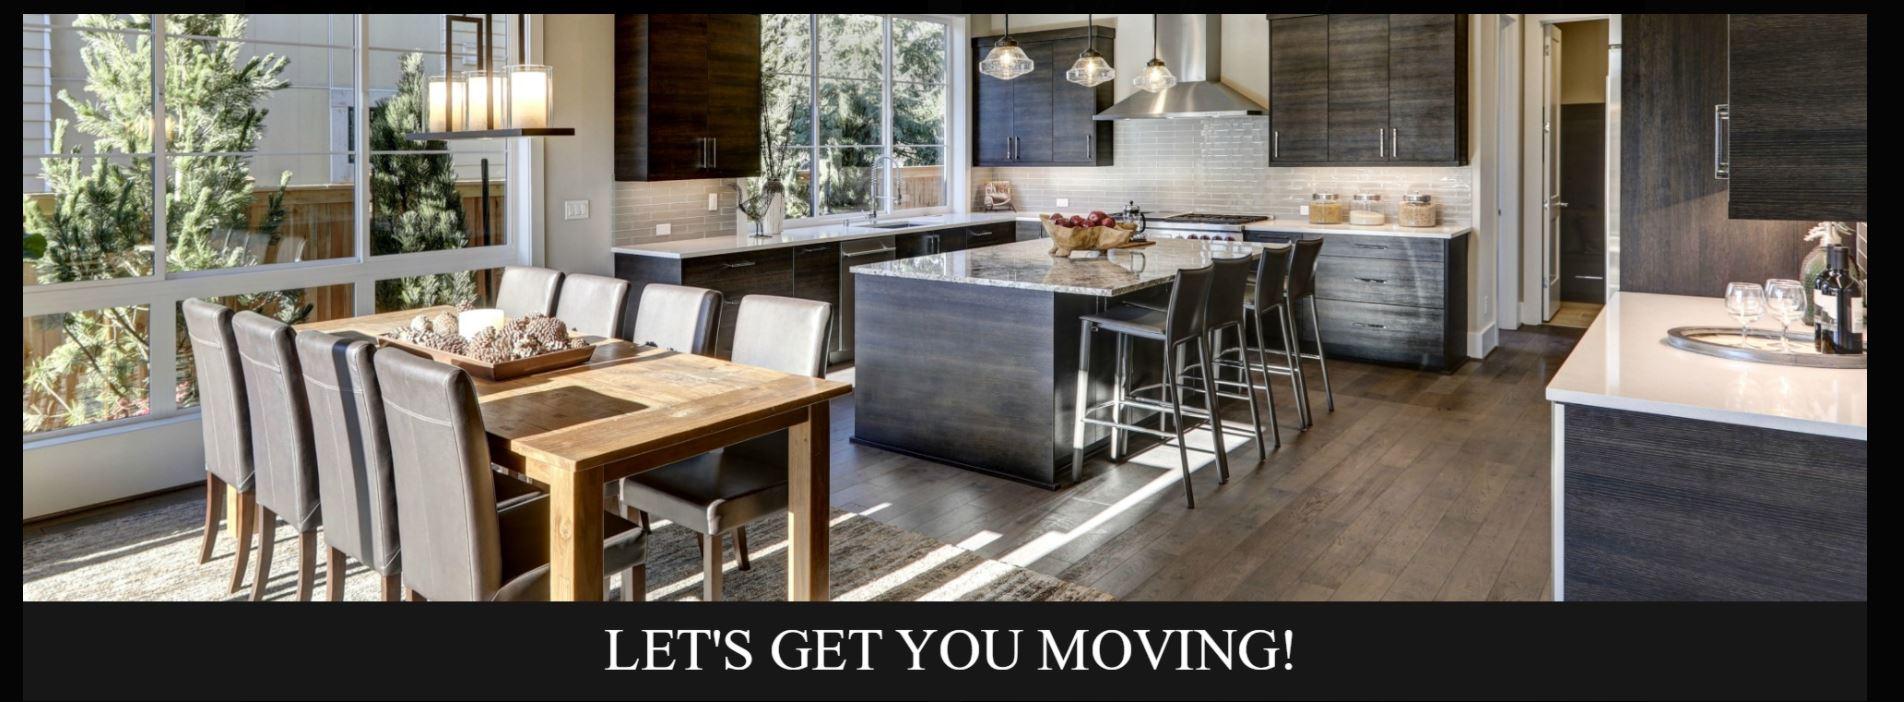 lets get you moving.JPG